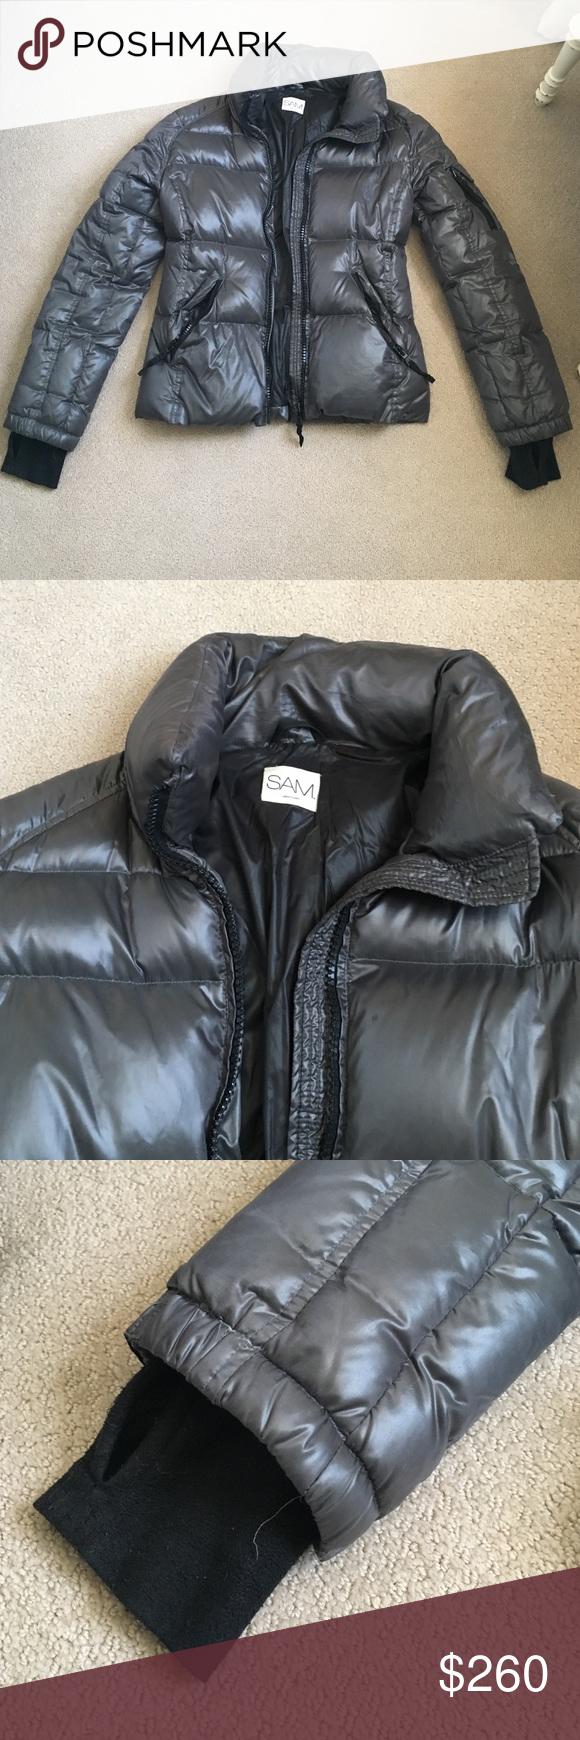 Sam Jacket Jackets Gray Jacket Women Shopping [ 1740 x 580 Pixel ]